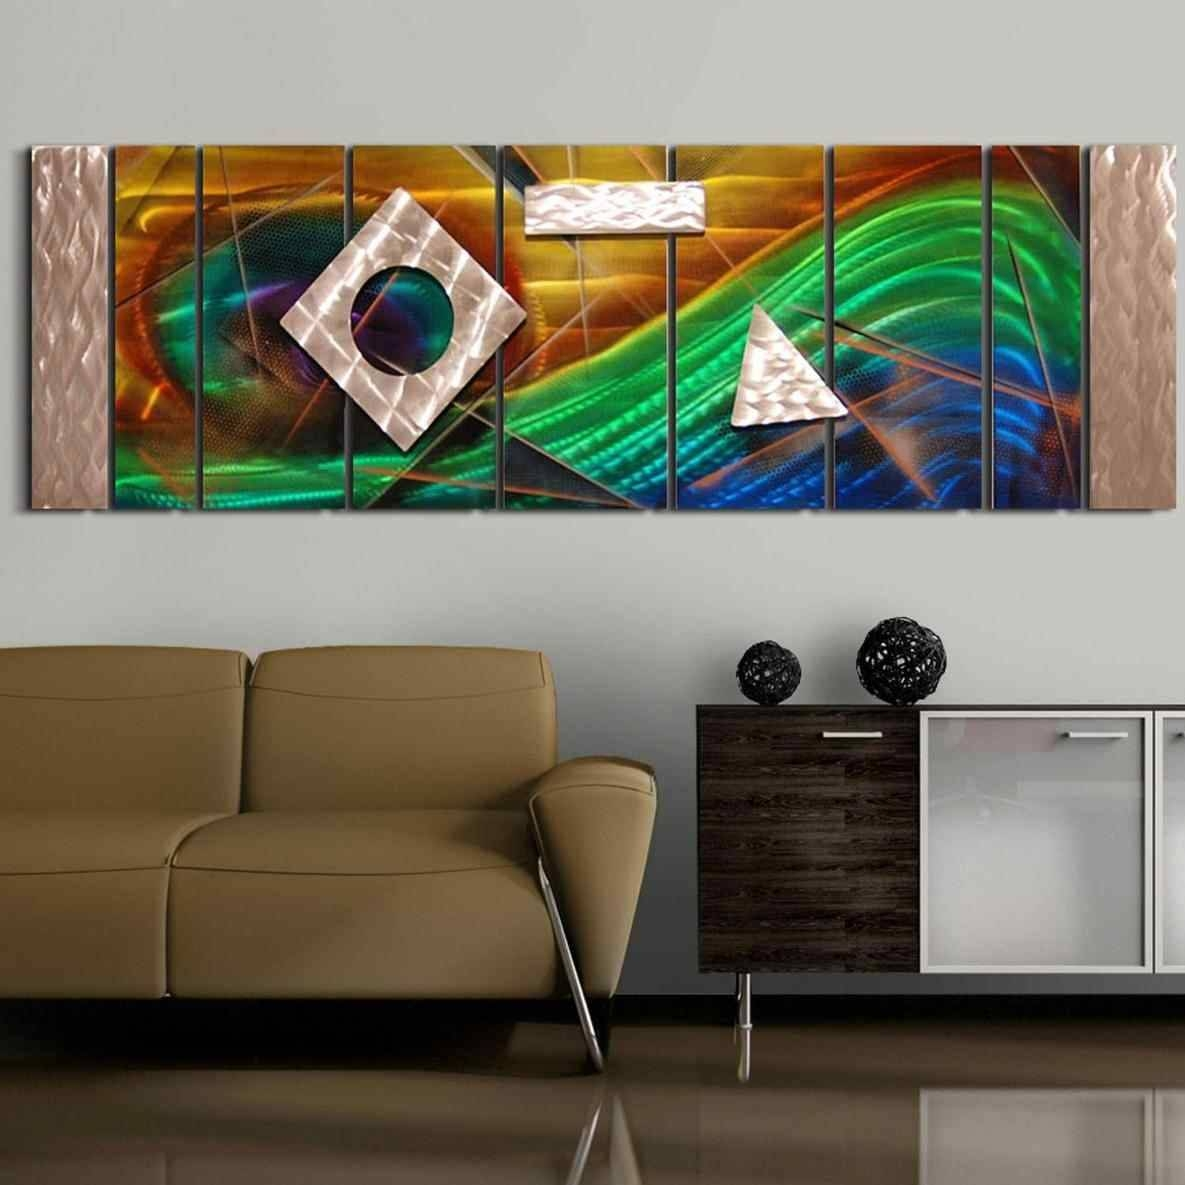 Multi Color Metal Wall Art | Home Interior Decor Inside Most Up To Date Multi Color Metal Wall Art (View 14 of 20)